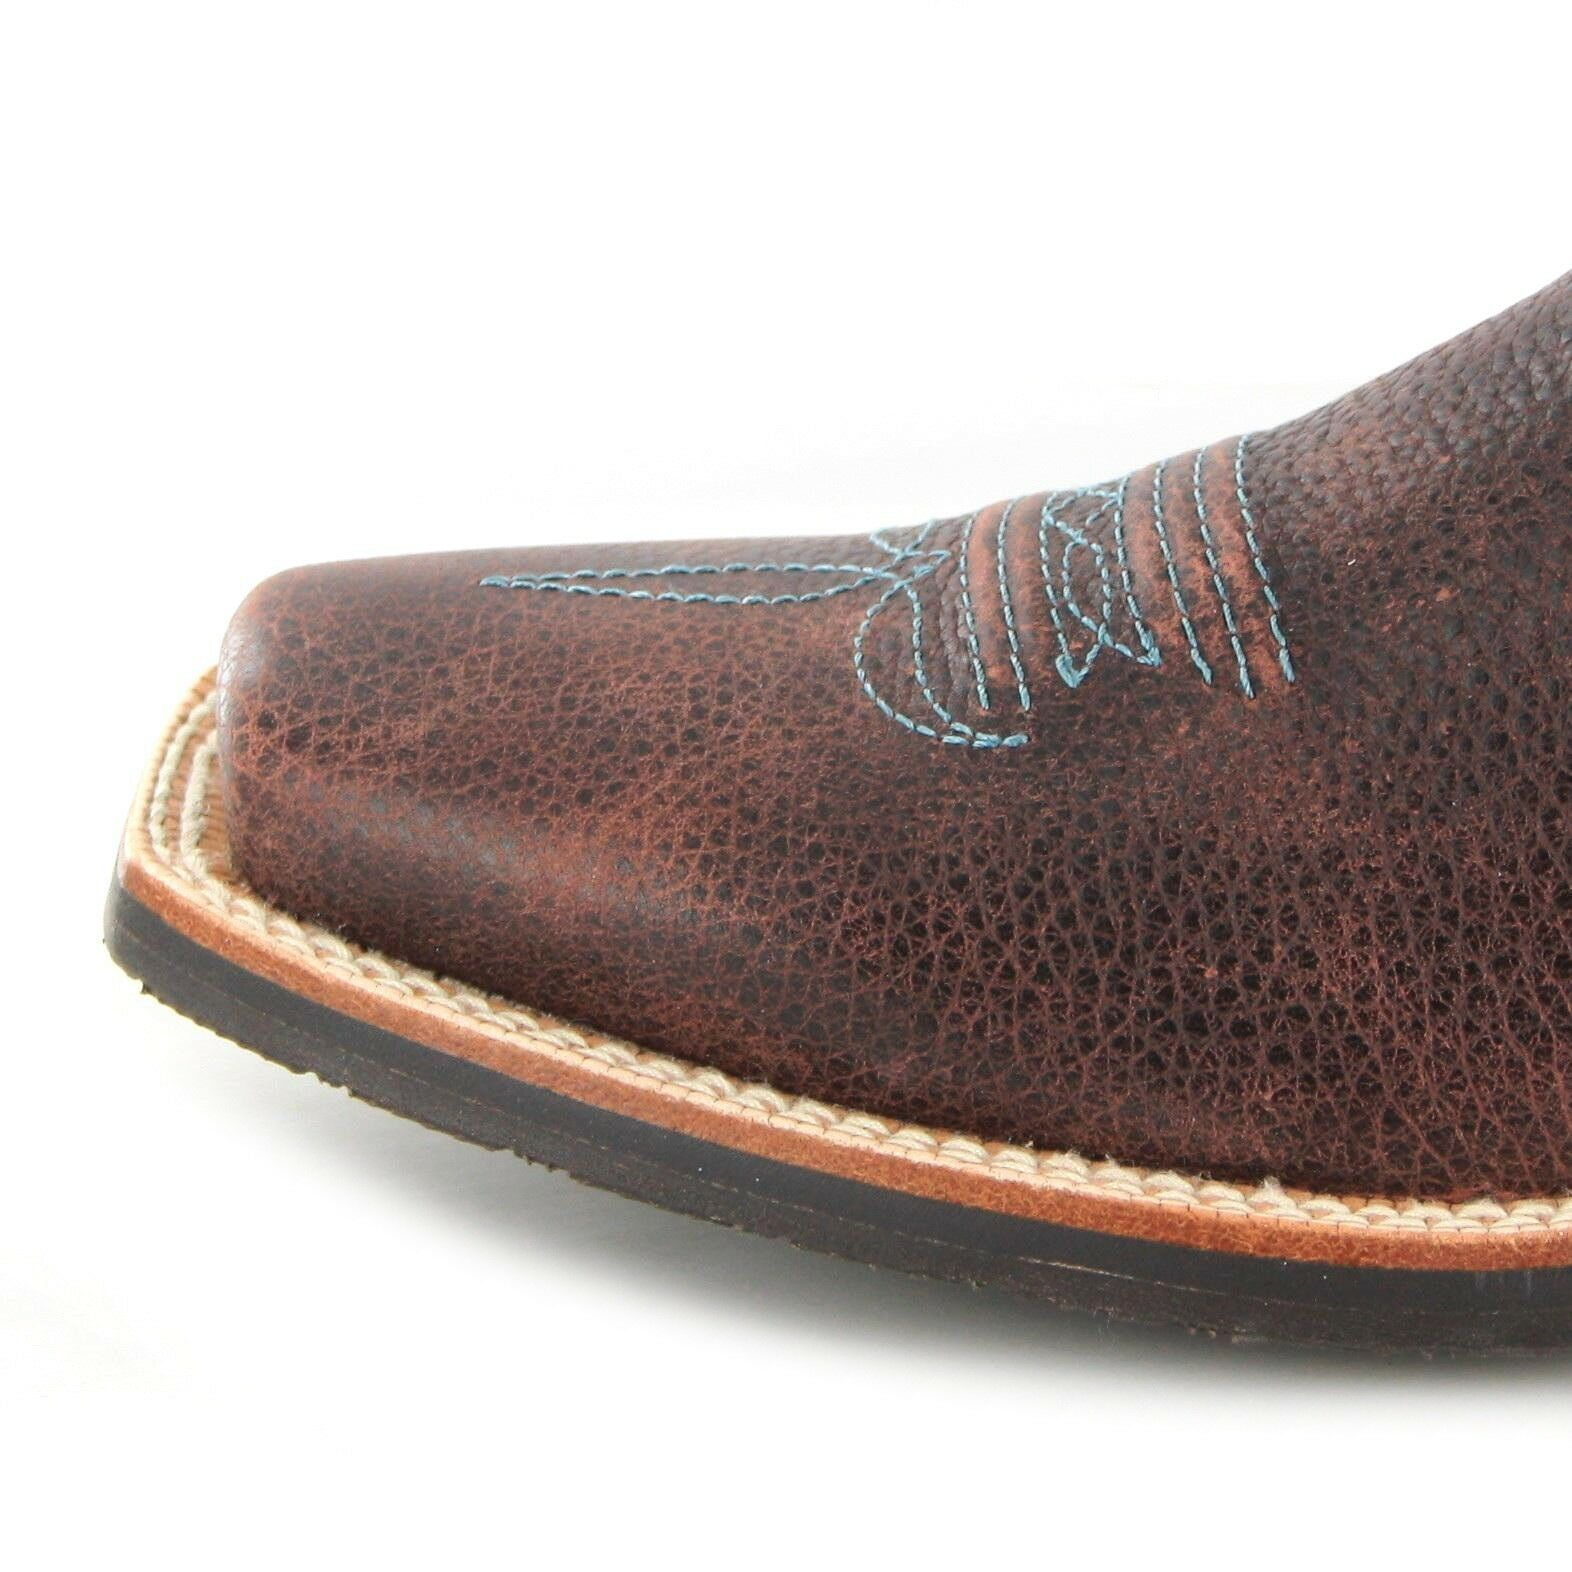 Twisted X X X botas botas 1779 Ruff bastón Baun azul señora westernreitstiefel c961da